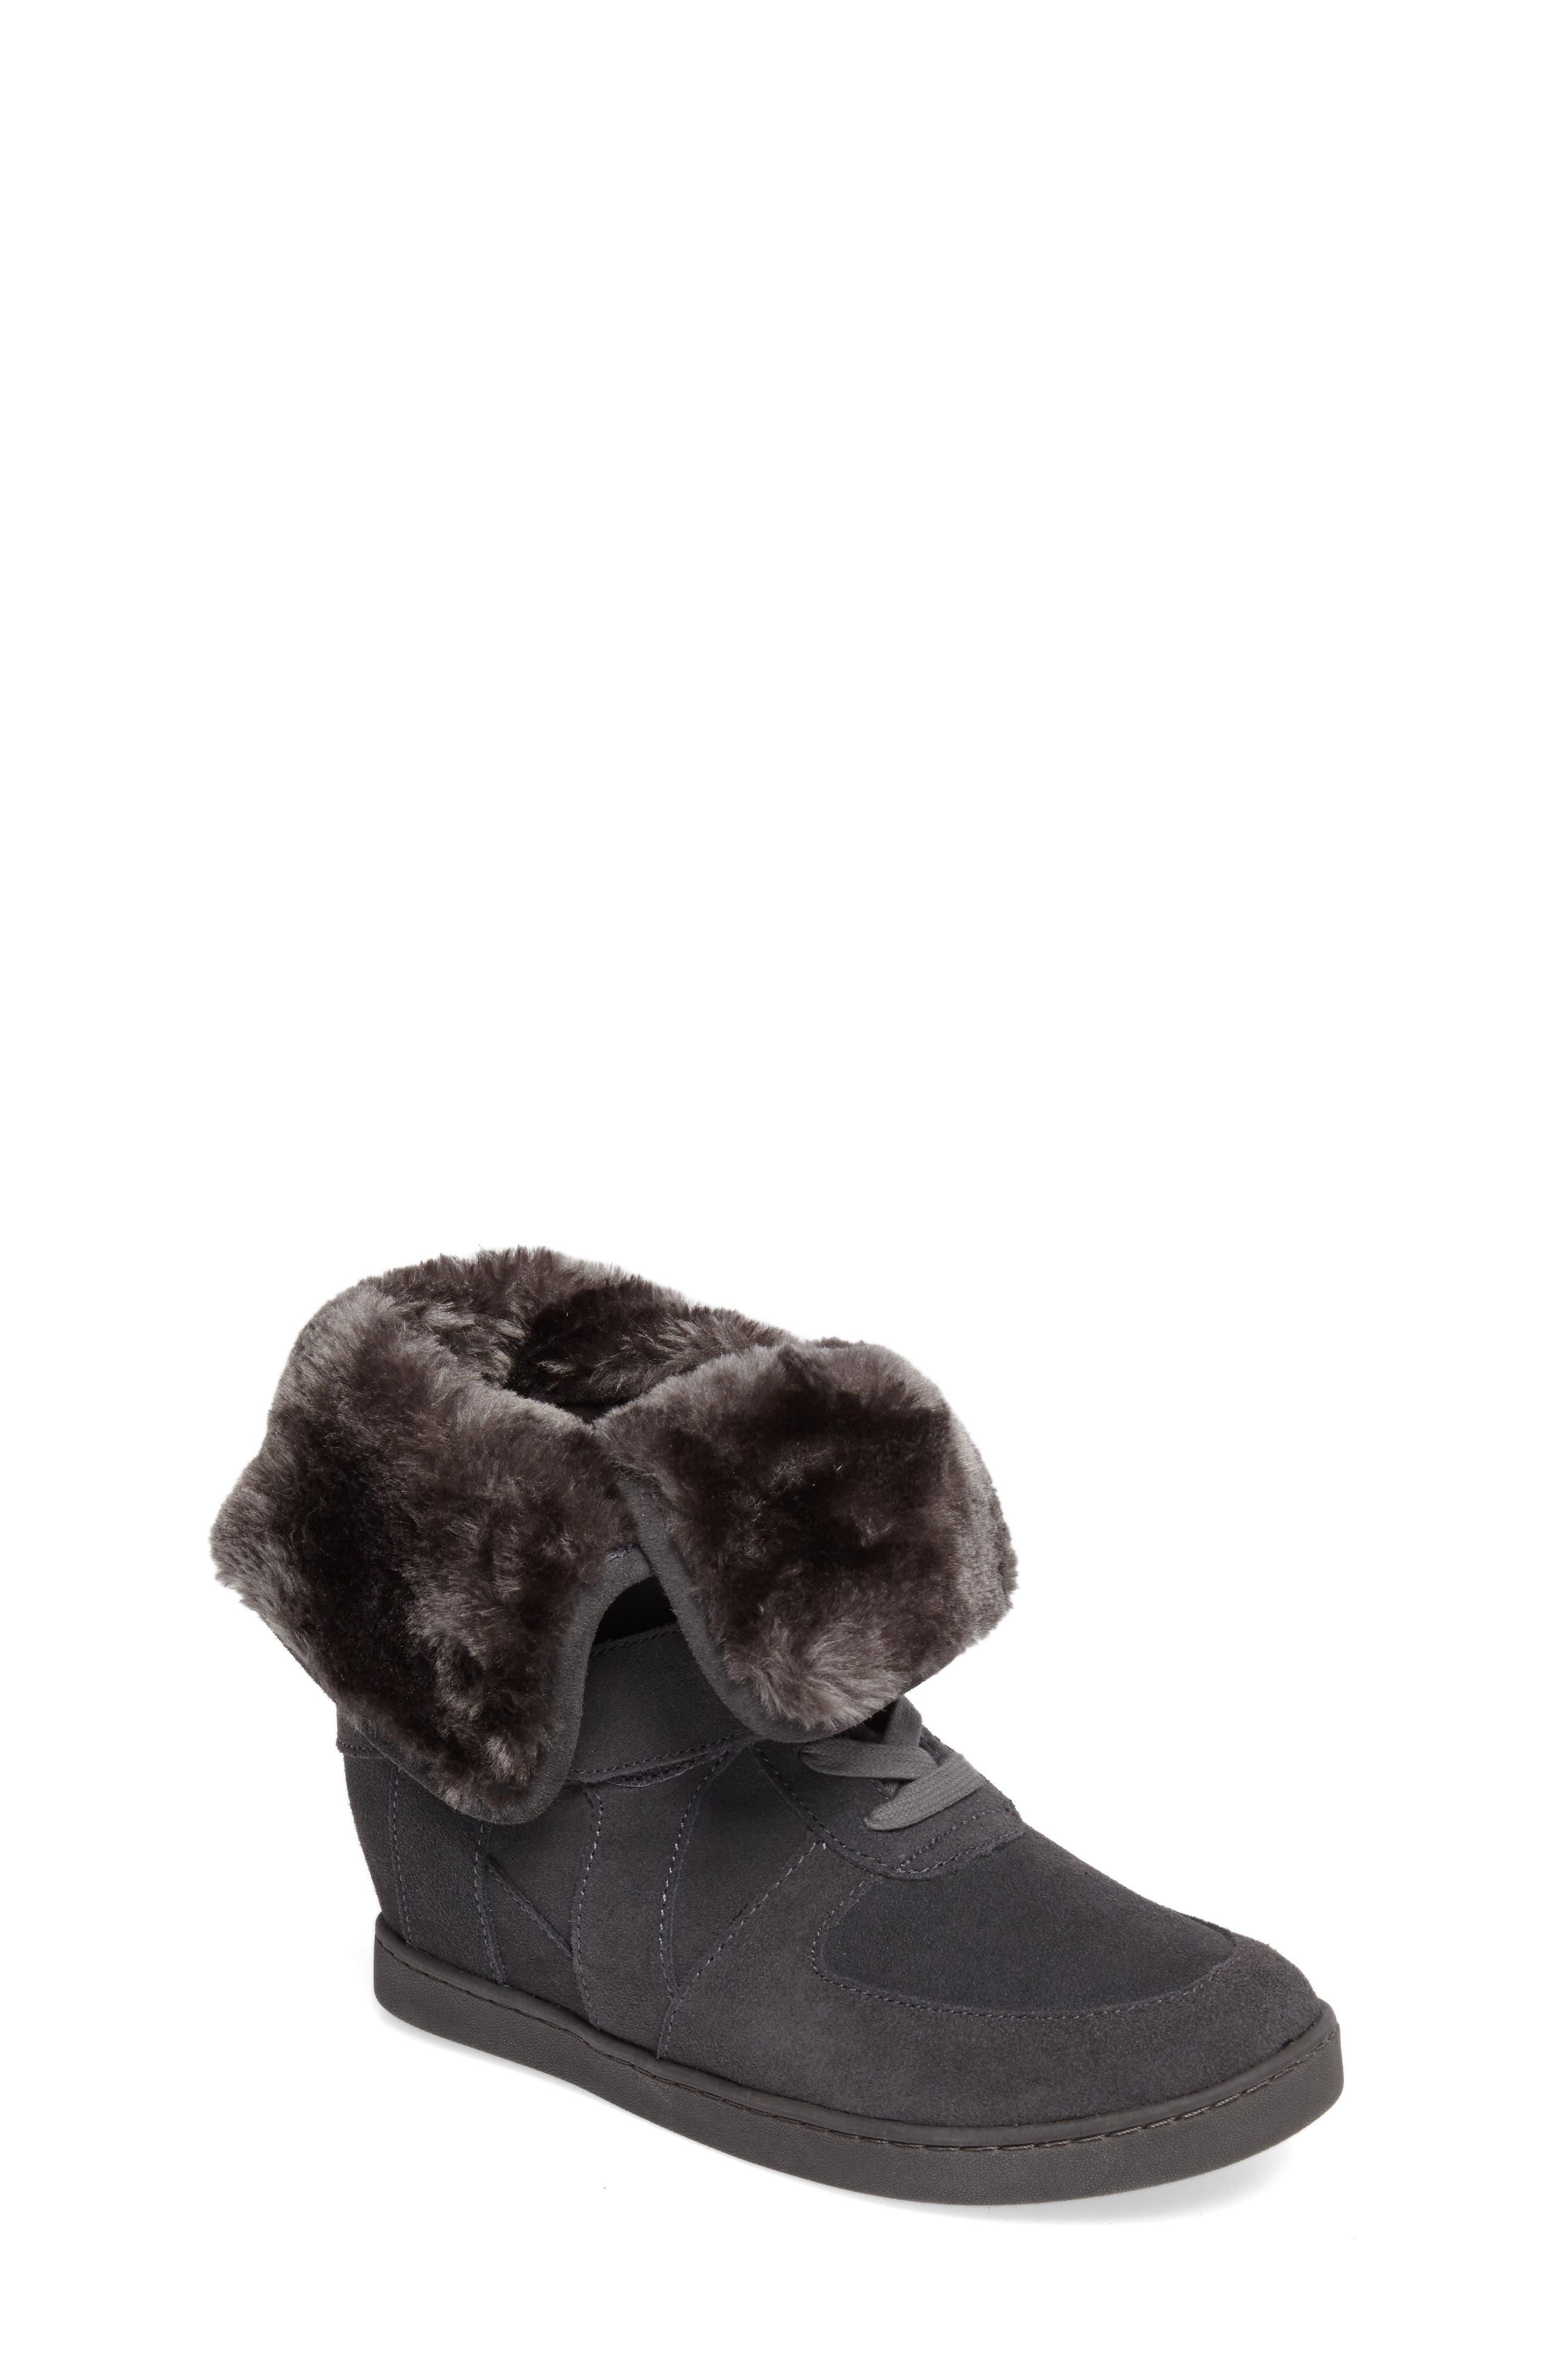 Main Image - Ash Boogie Beaver Faux Fur Cuffed Bootie (Toddler, Little Kid & Big Kid)